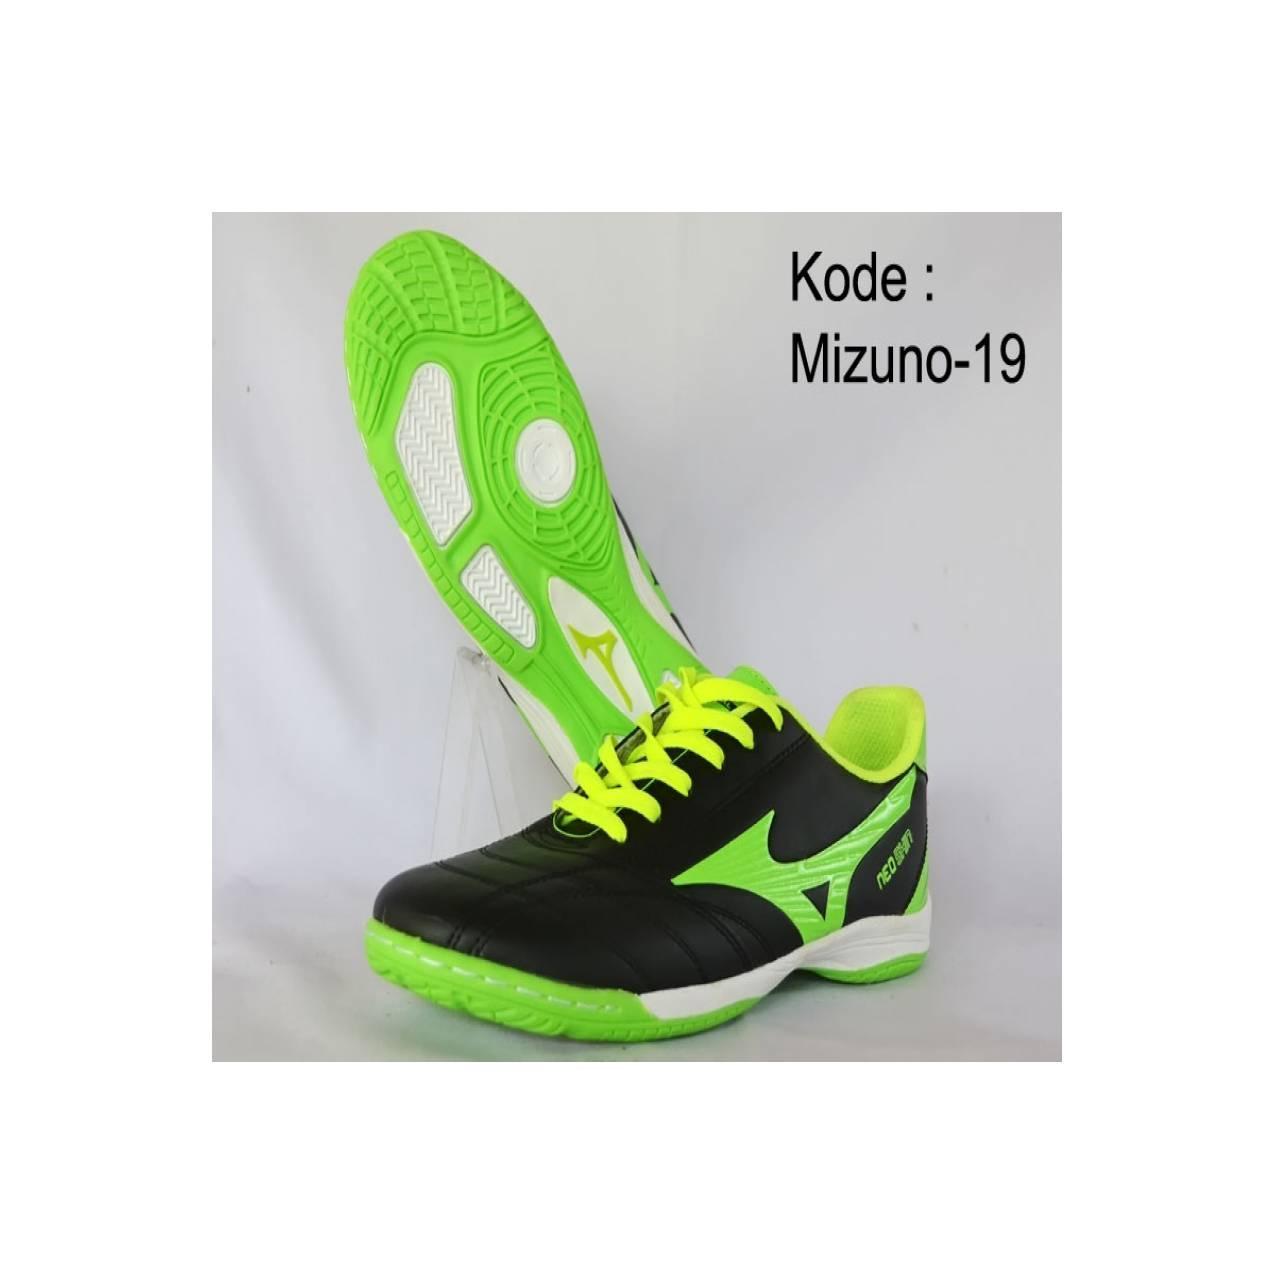 Sepatu Futsal Mizuno KW 1 Kode Mizuno 28